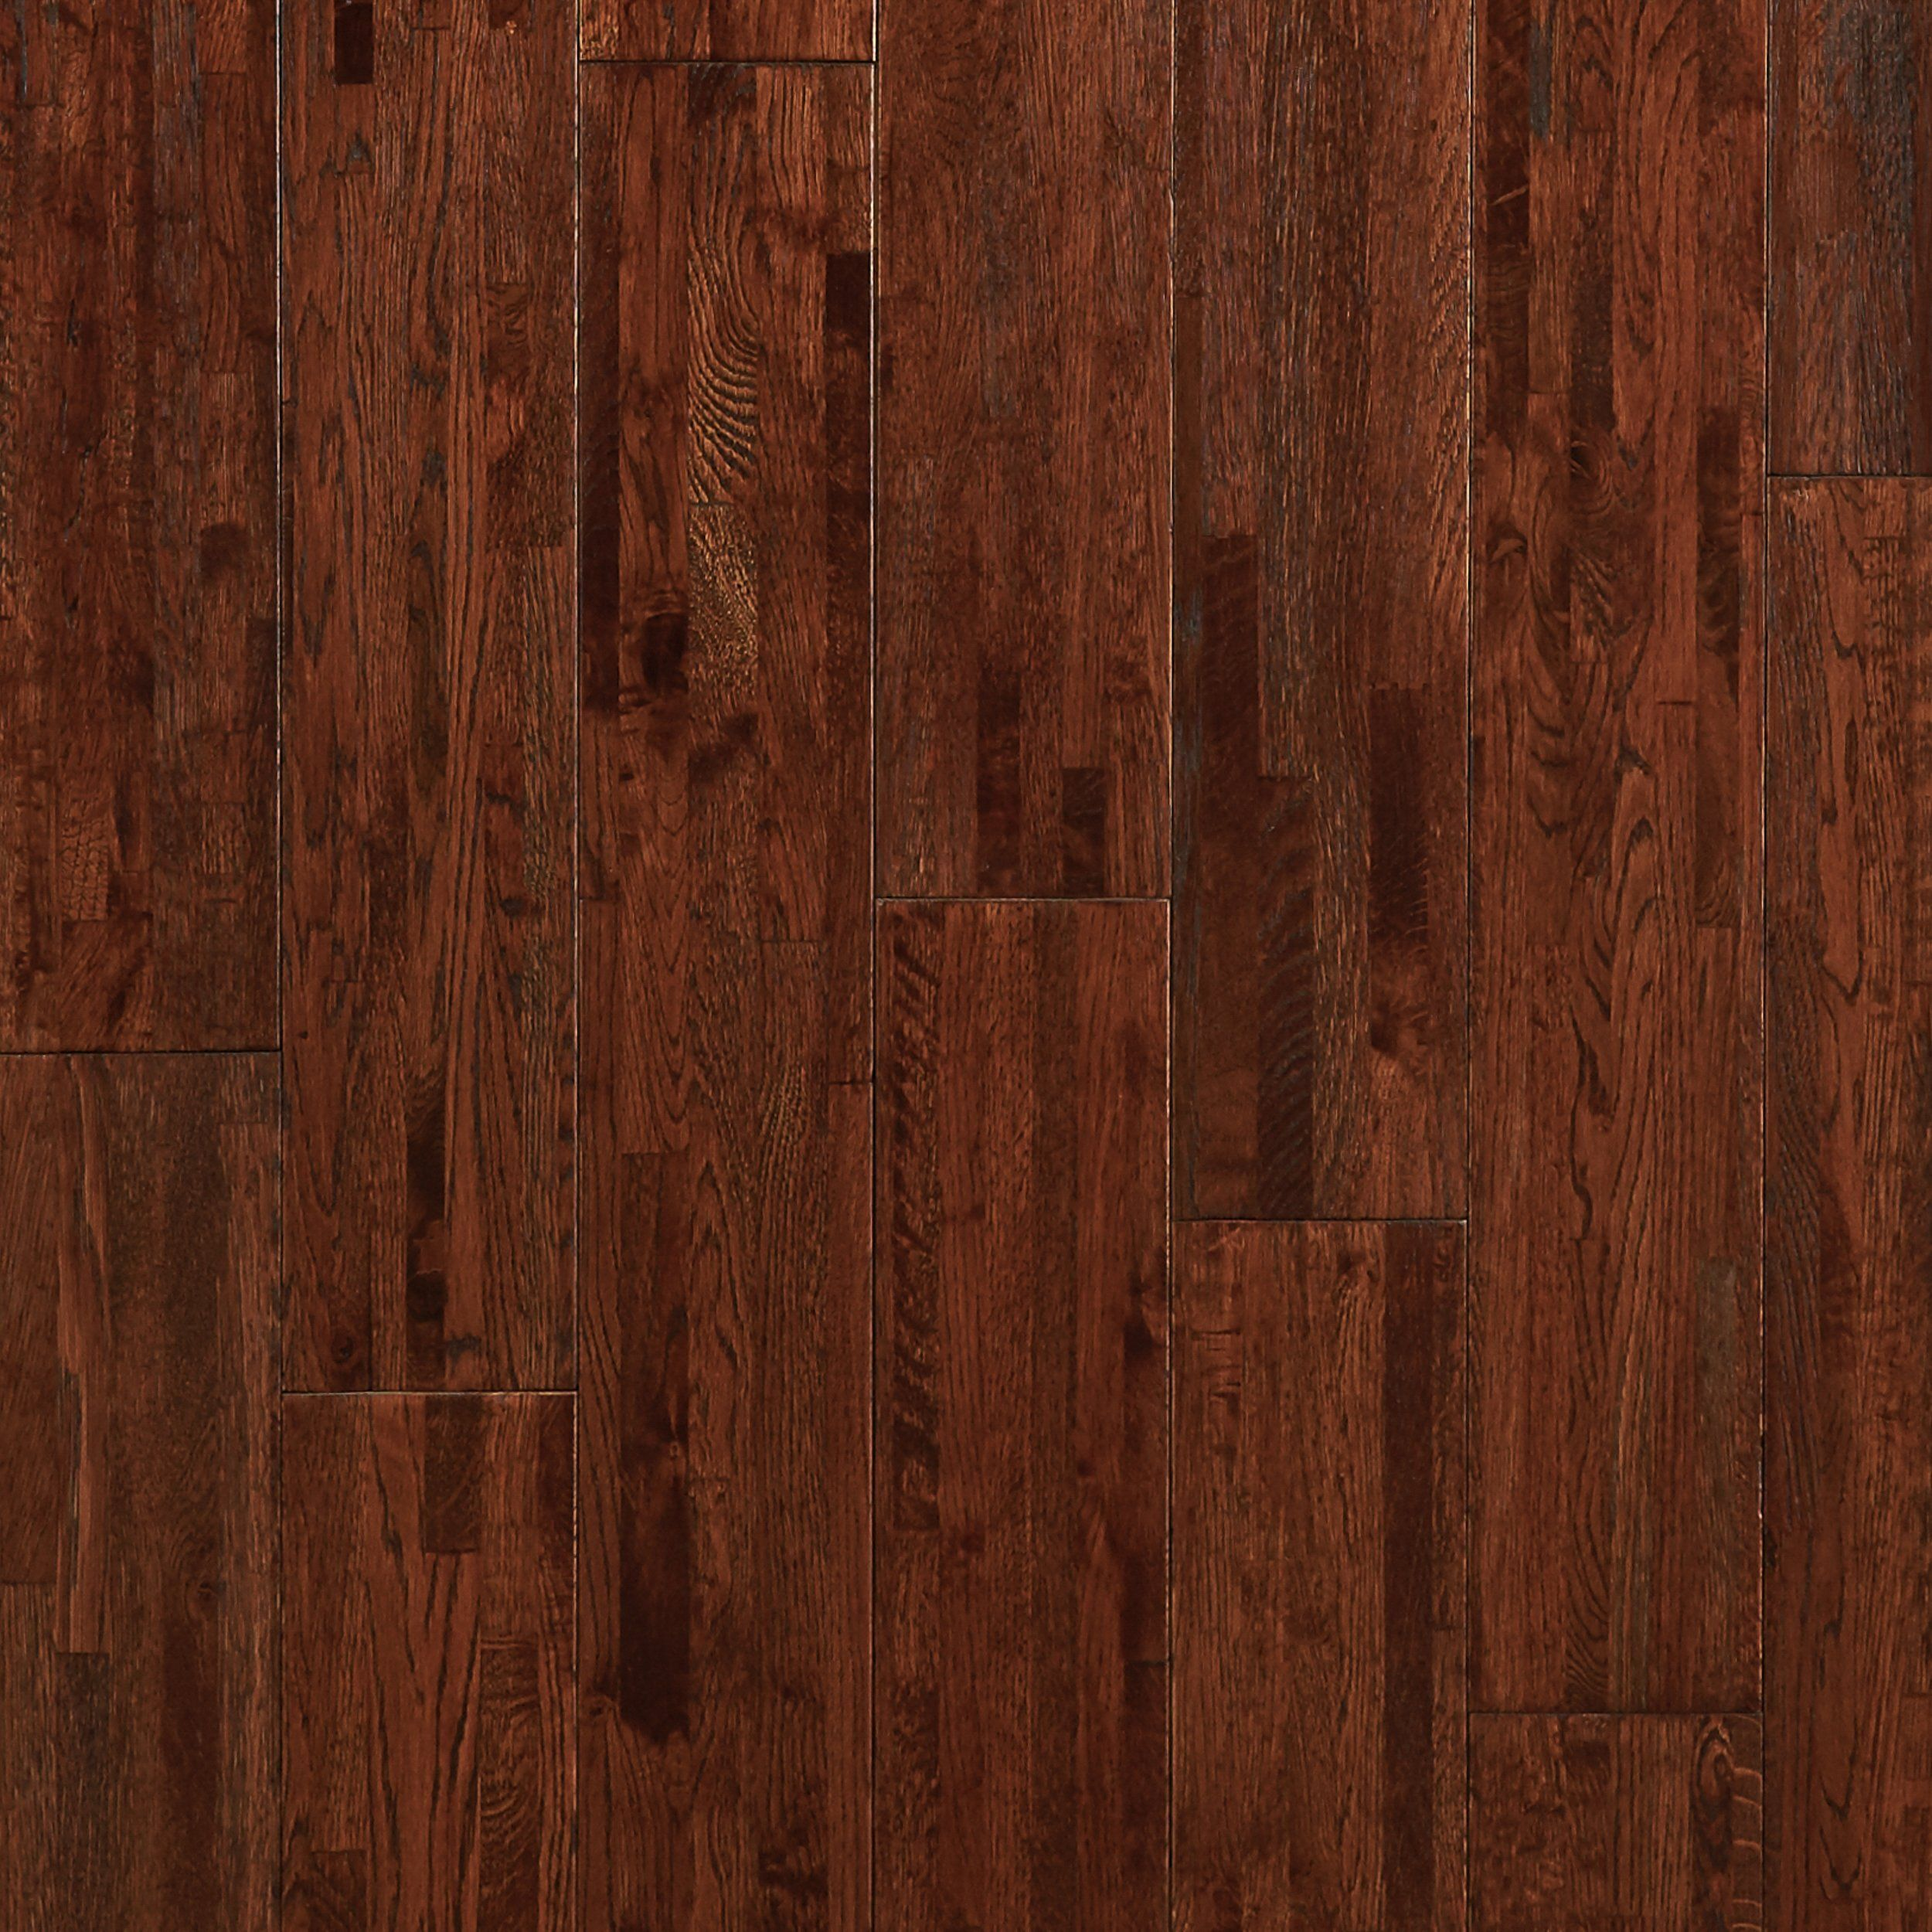 Cognac Oak Wire Brushed Solid Hardwood Solid Hardwood Floors Solid Hardwood Hardwood